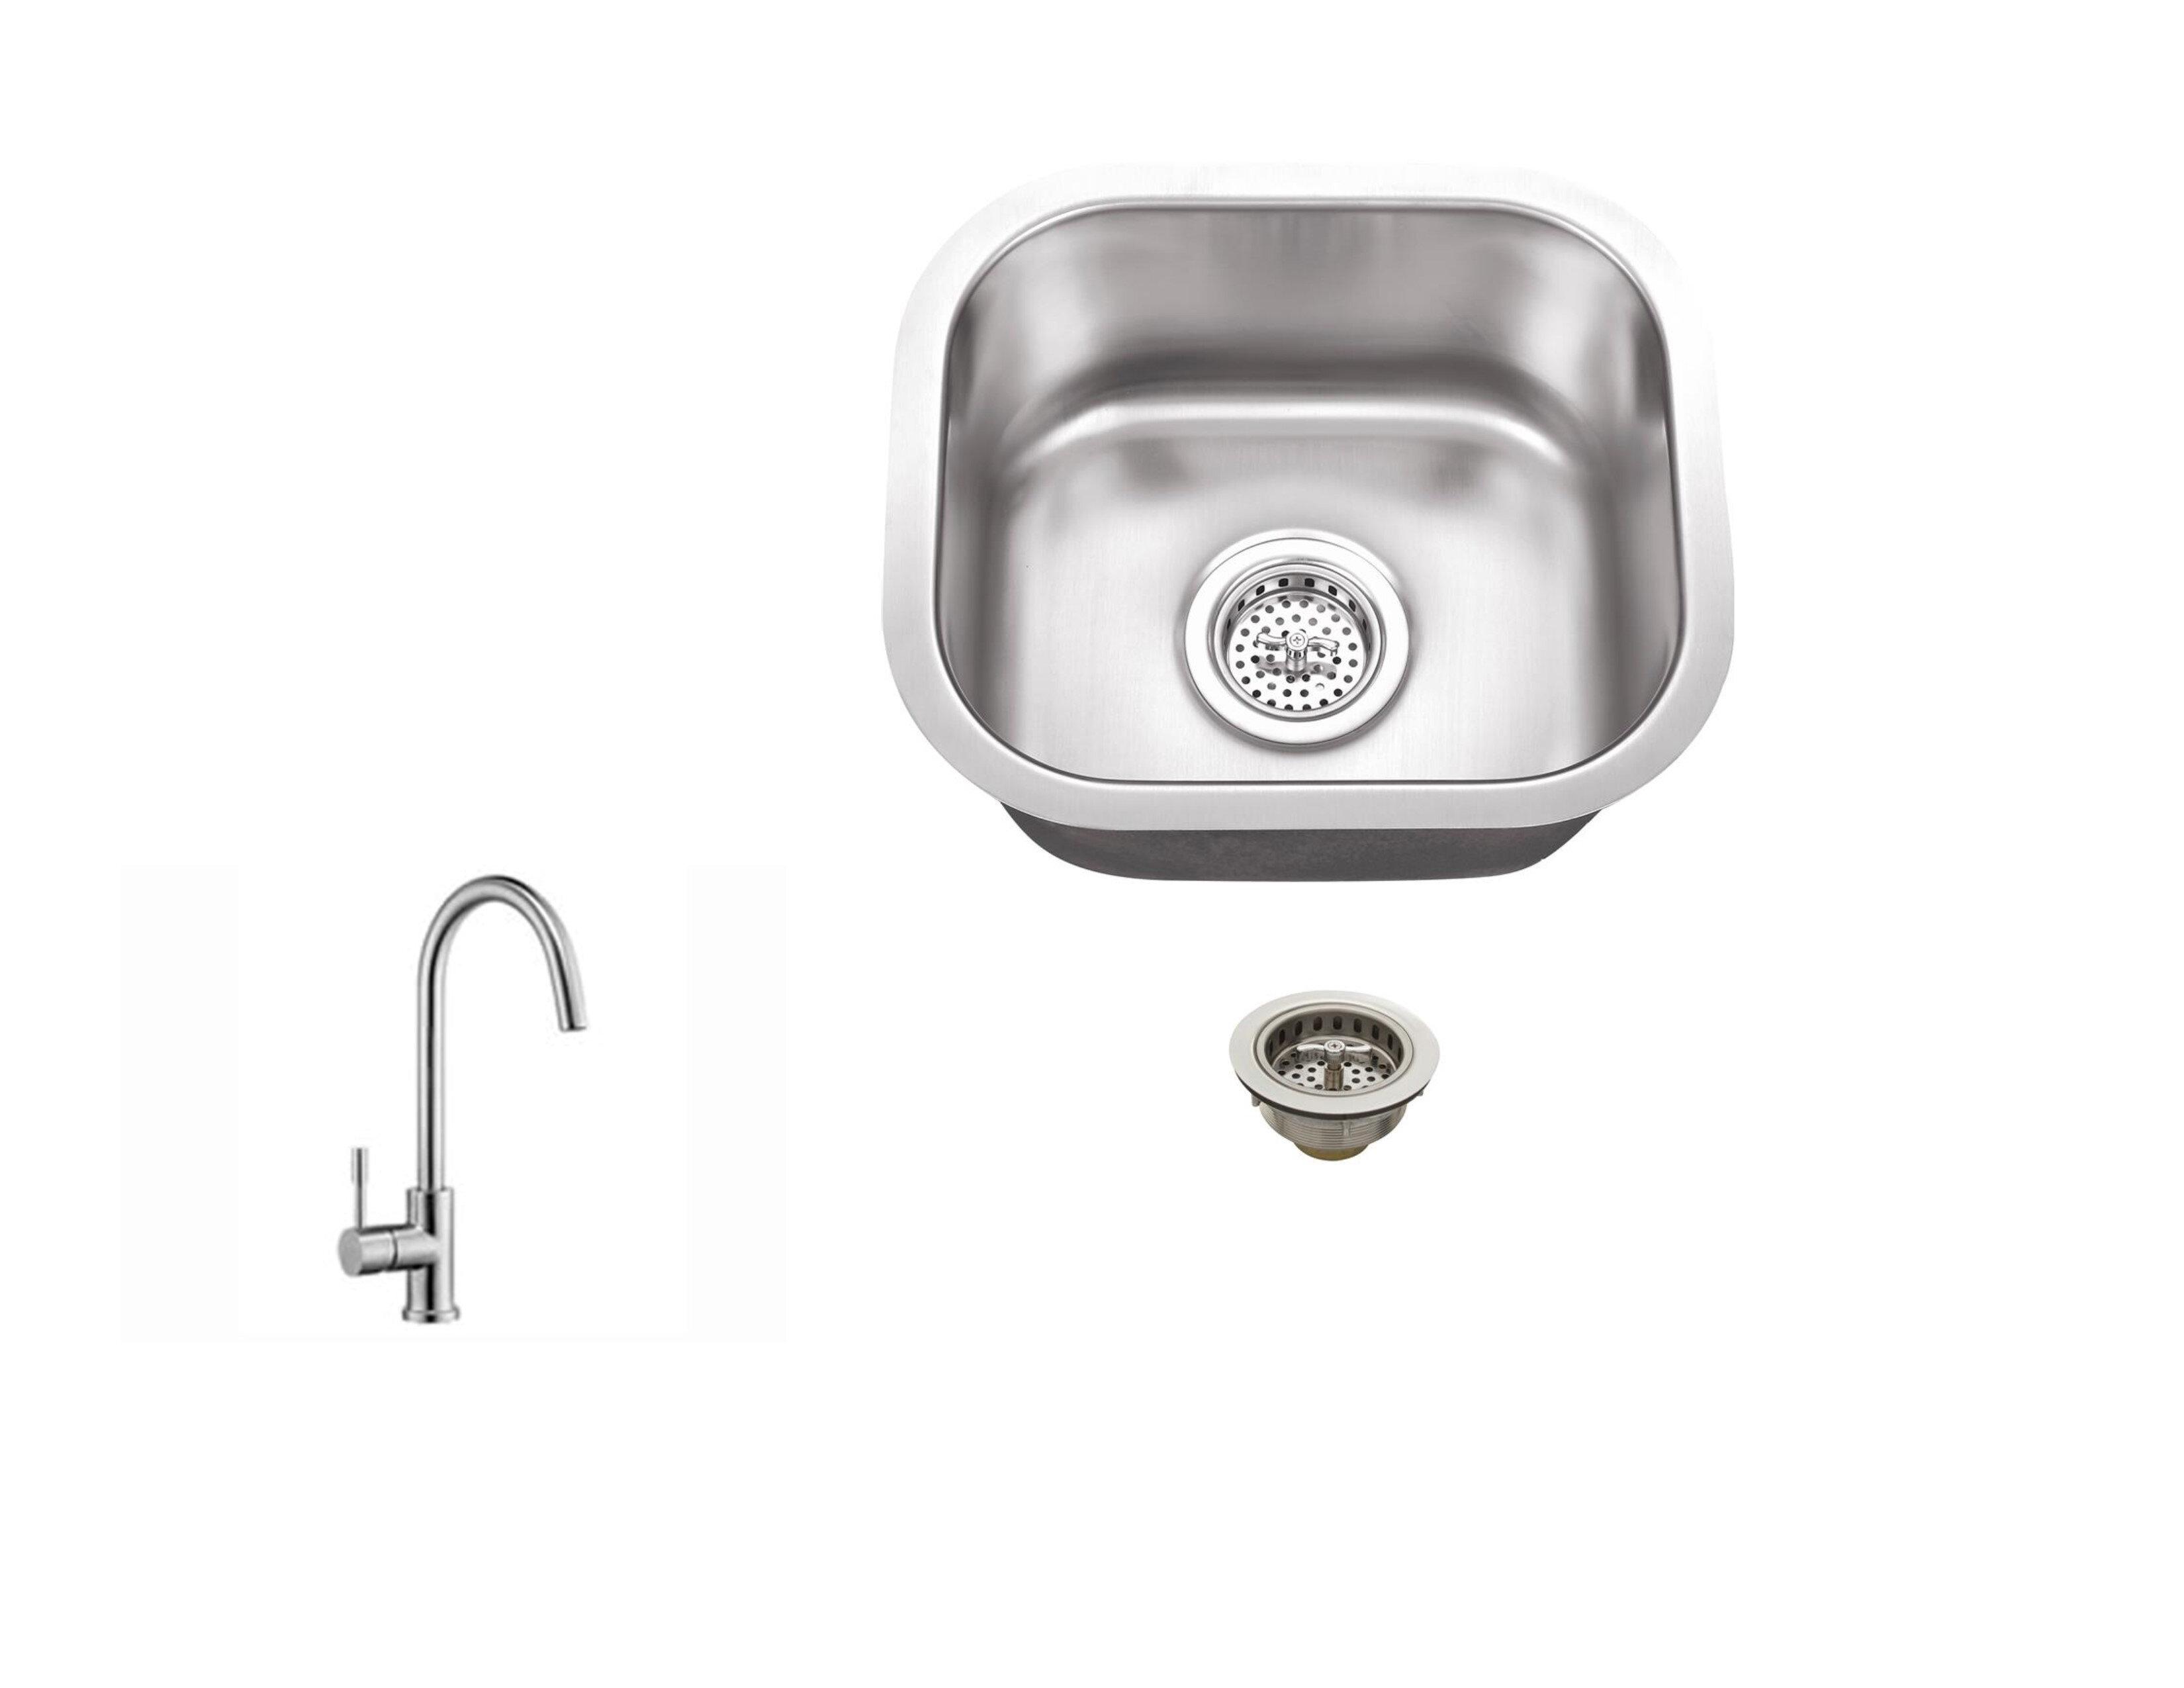 Soleil 145 L X 13 W Undermount Bar Sink With Faucet Reviews